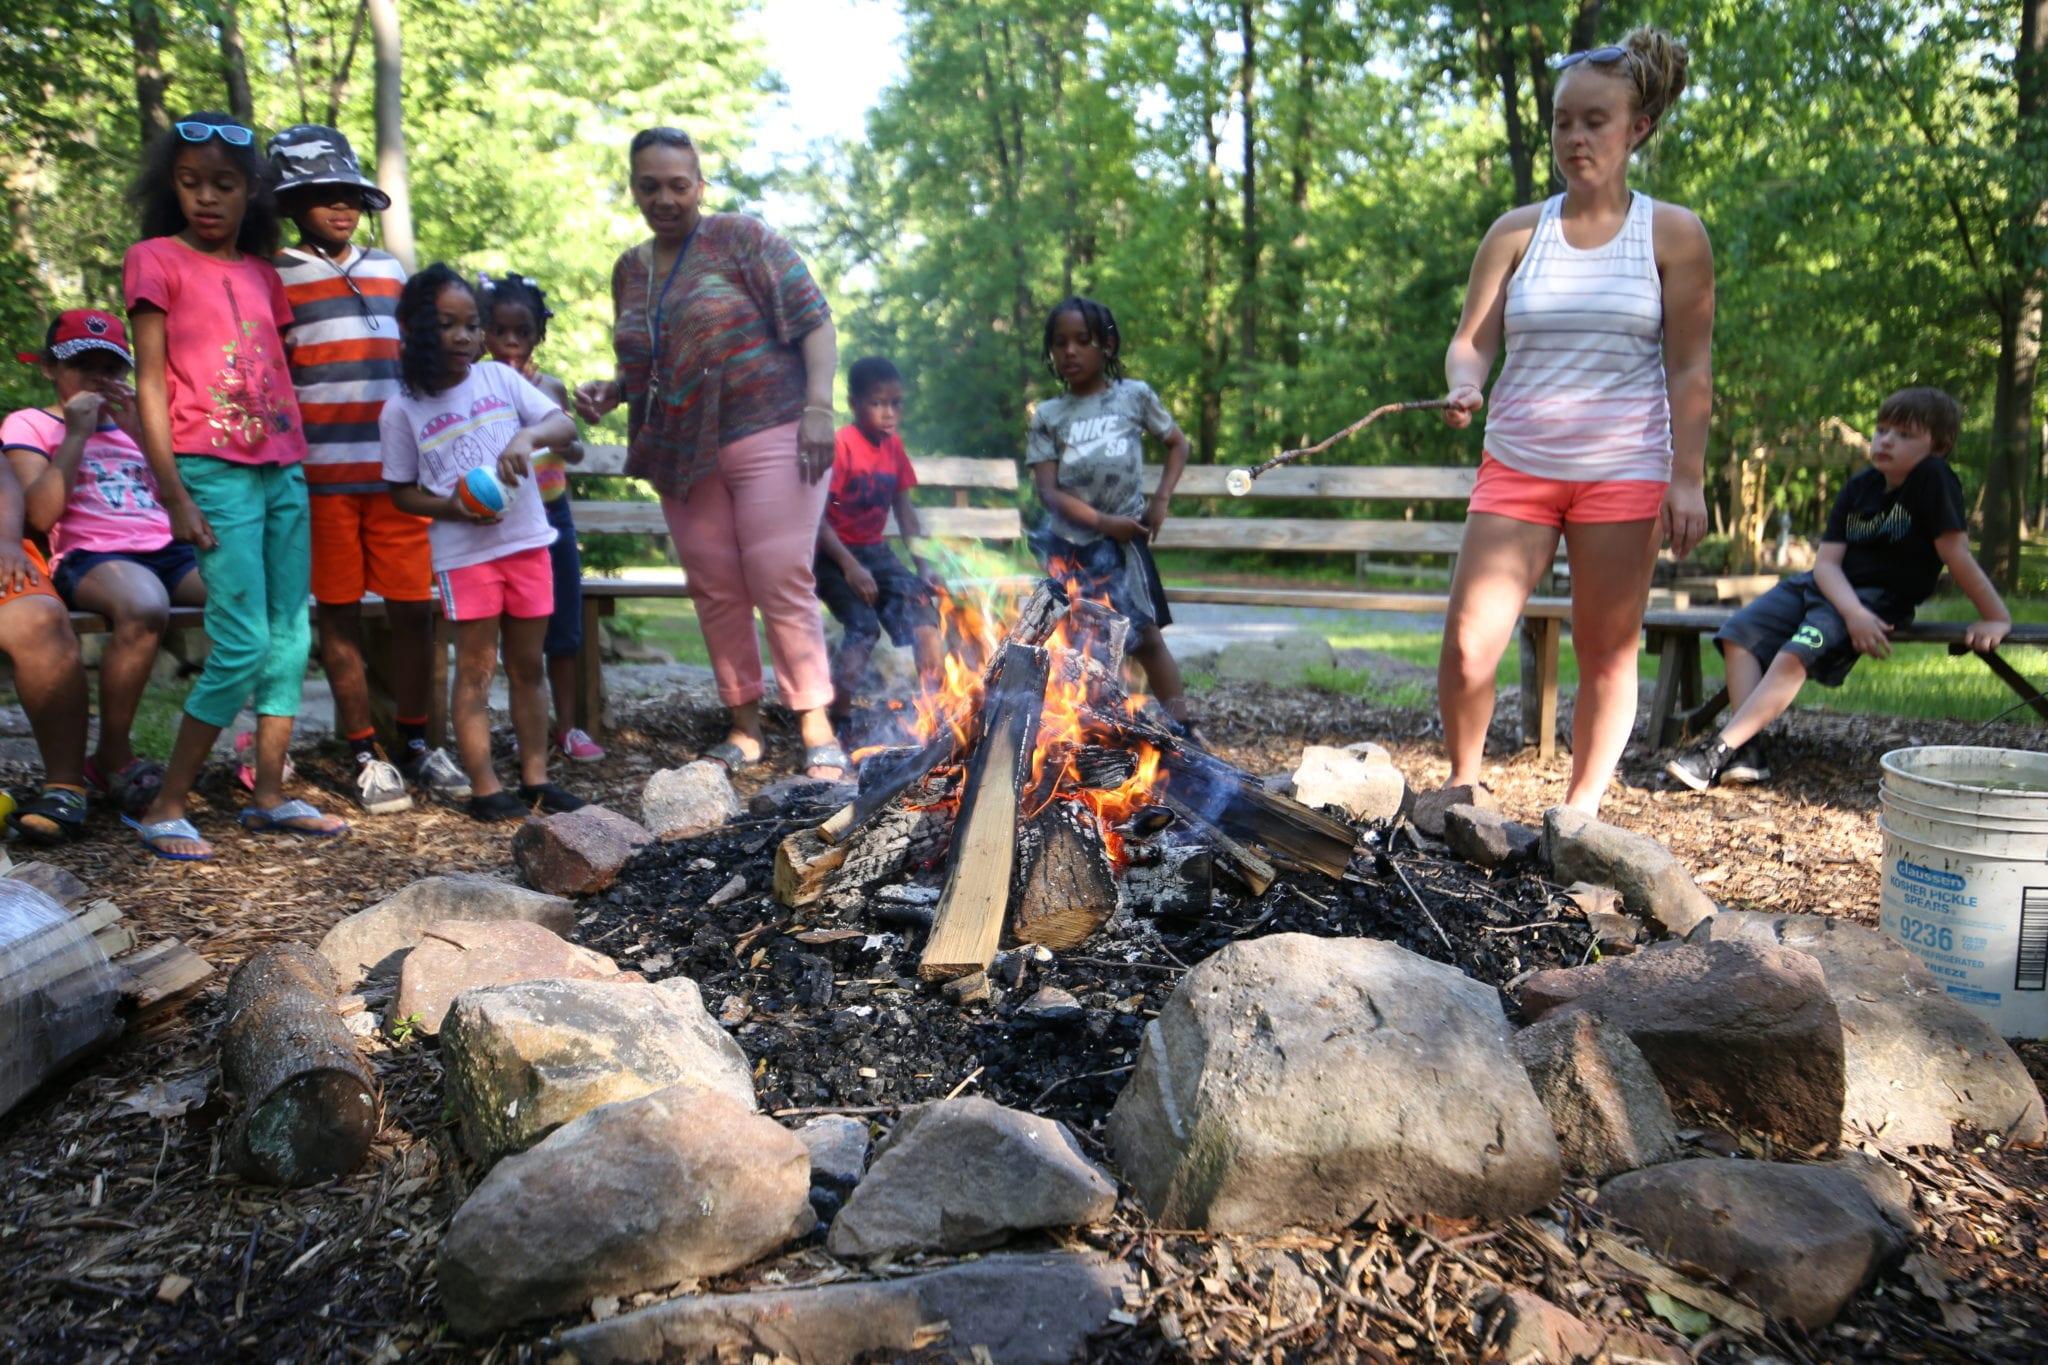 Campfire family retreat fun around the campfire